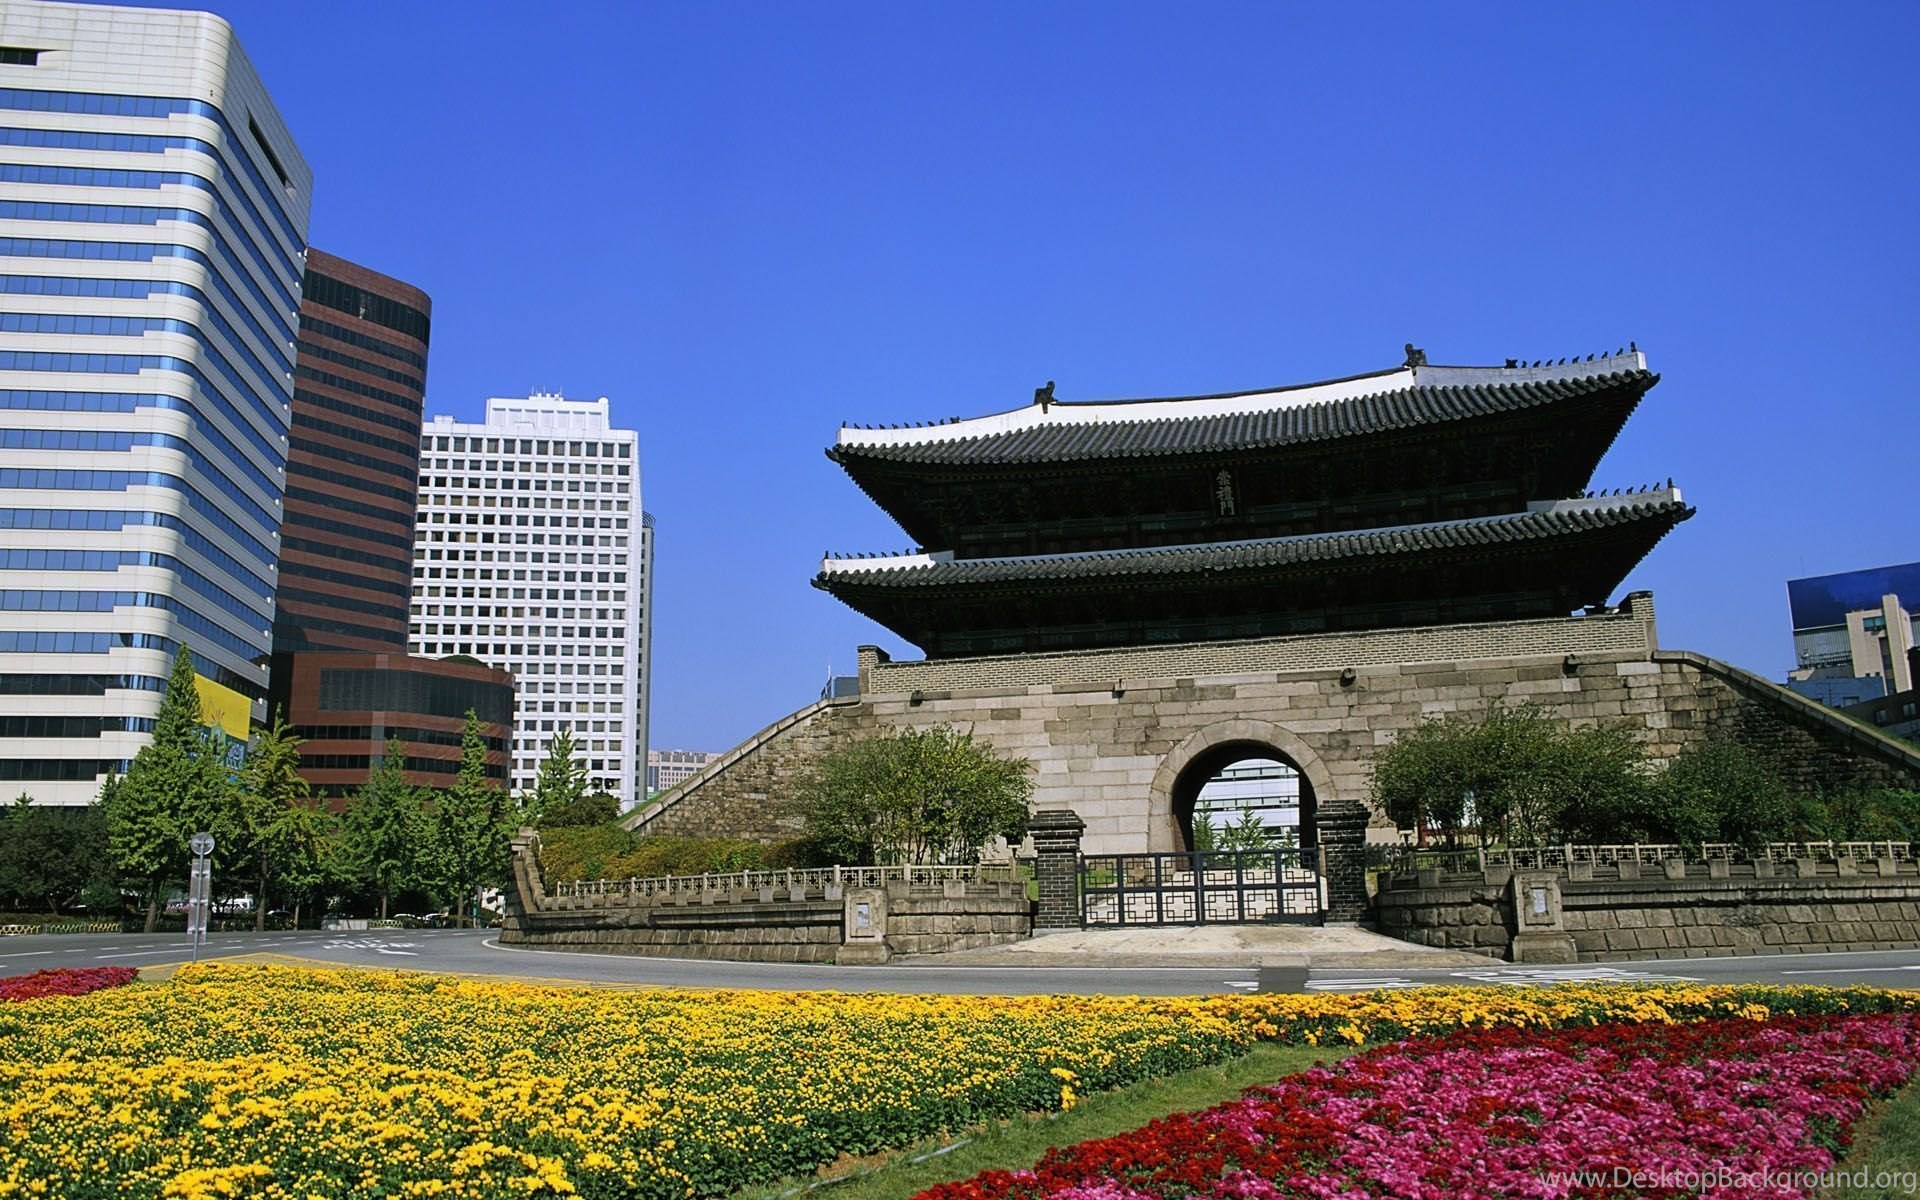 South Korea Temple Seoul Desktop Background